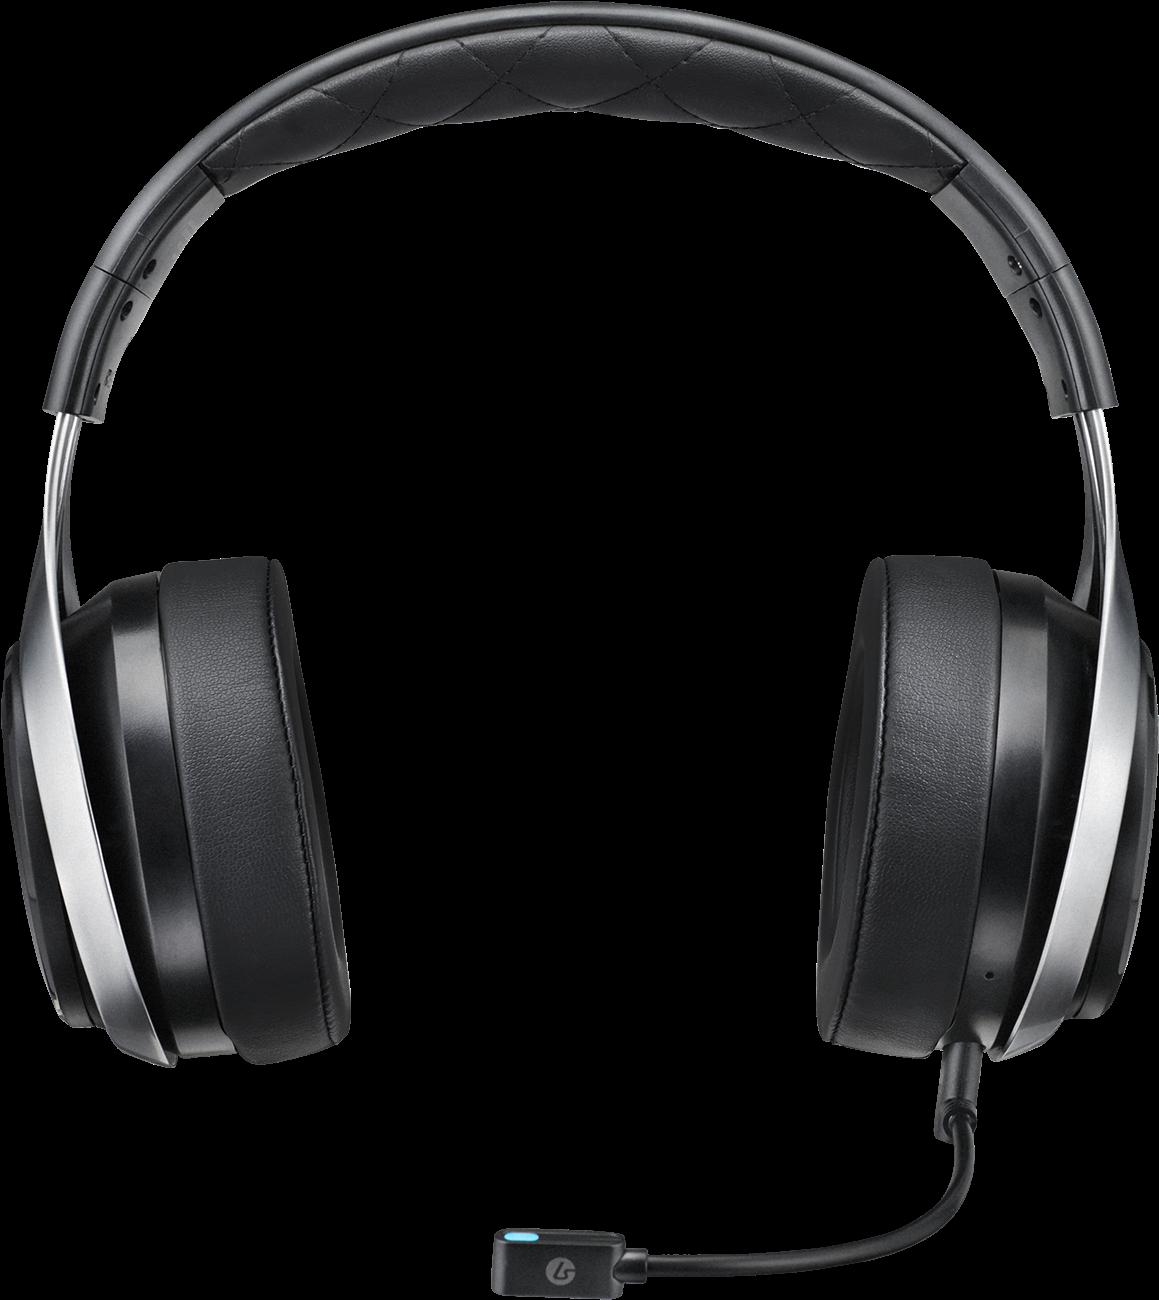 Headphones Microphone Xbox 360 Wireless Headset Transparent Background Headset Transparent Transparent Cartoon Jing Fm